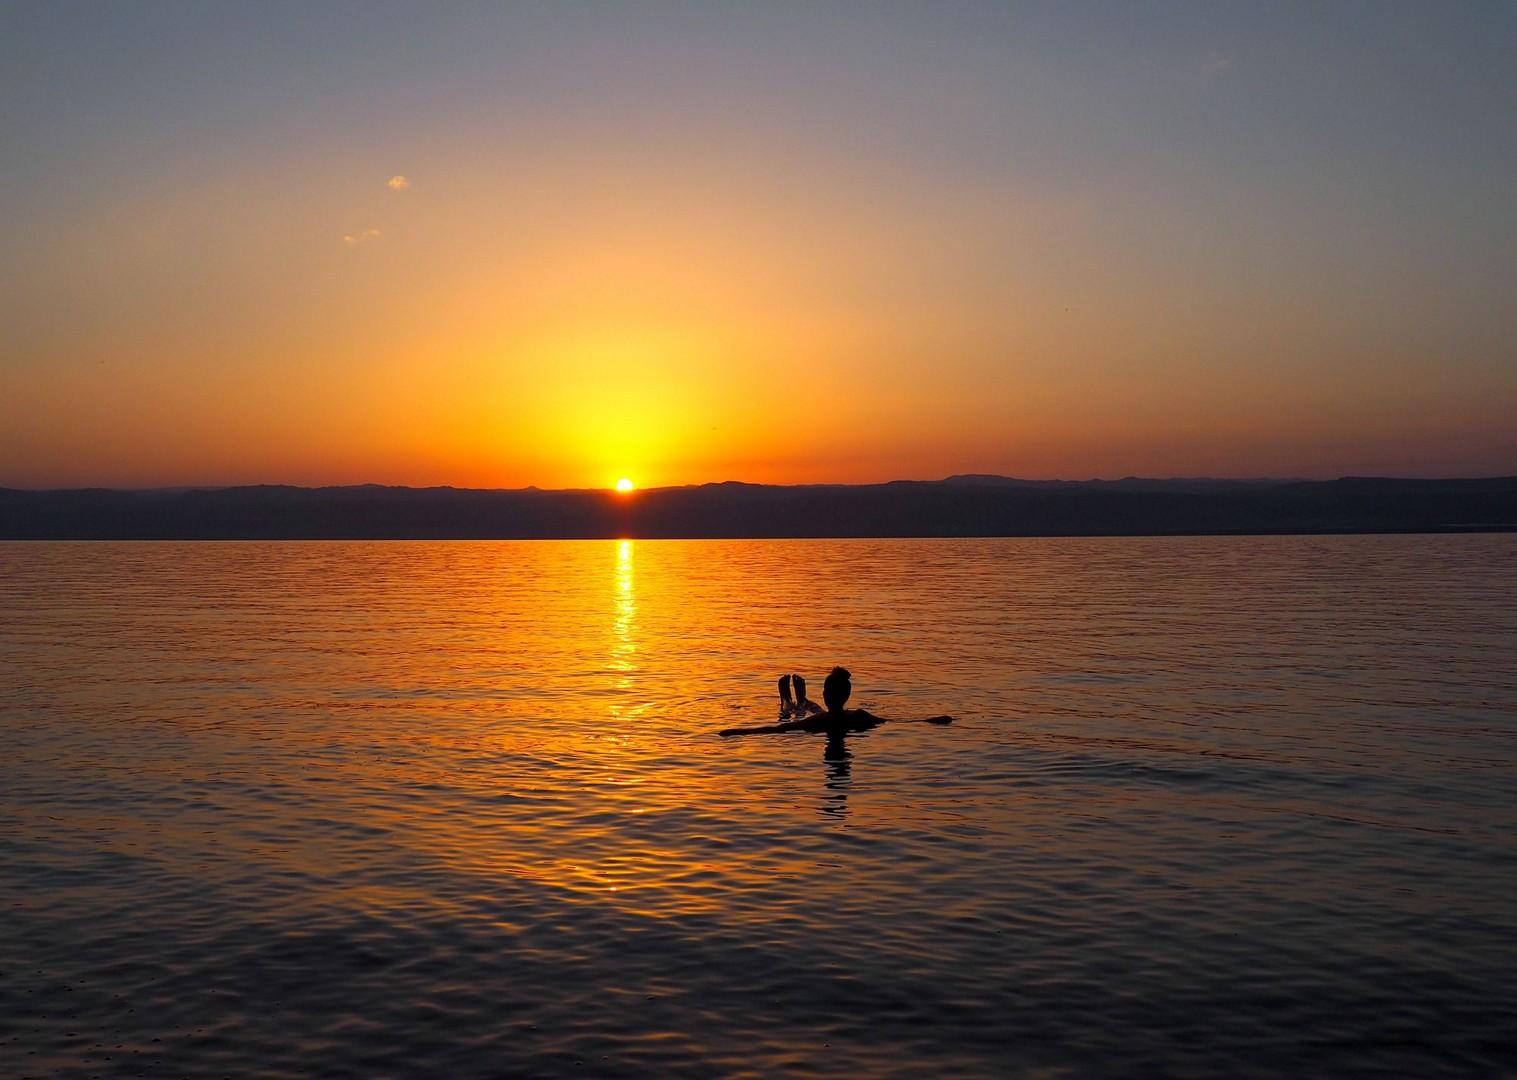 jordan-cycling-saddle-skedaddle-holidays-trip-adventure-sunset.jpg - NEW! Jordan - Petra, Wadi Rum & the Dead Sea - Cycling Adventures